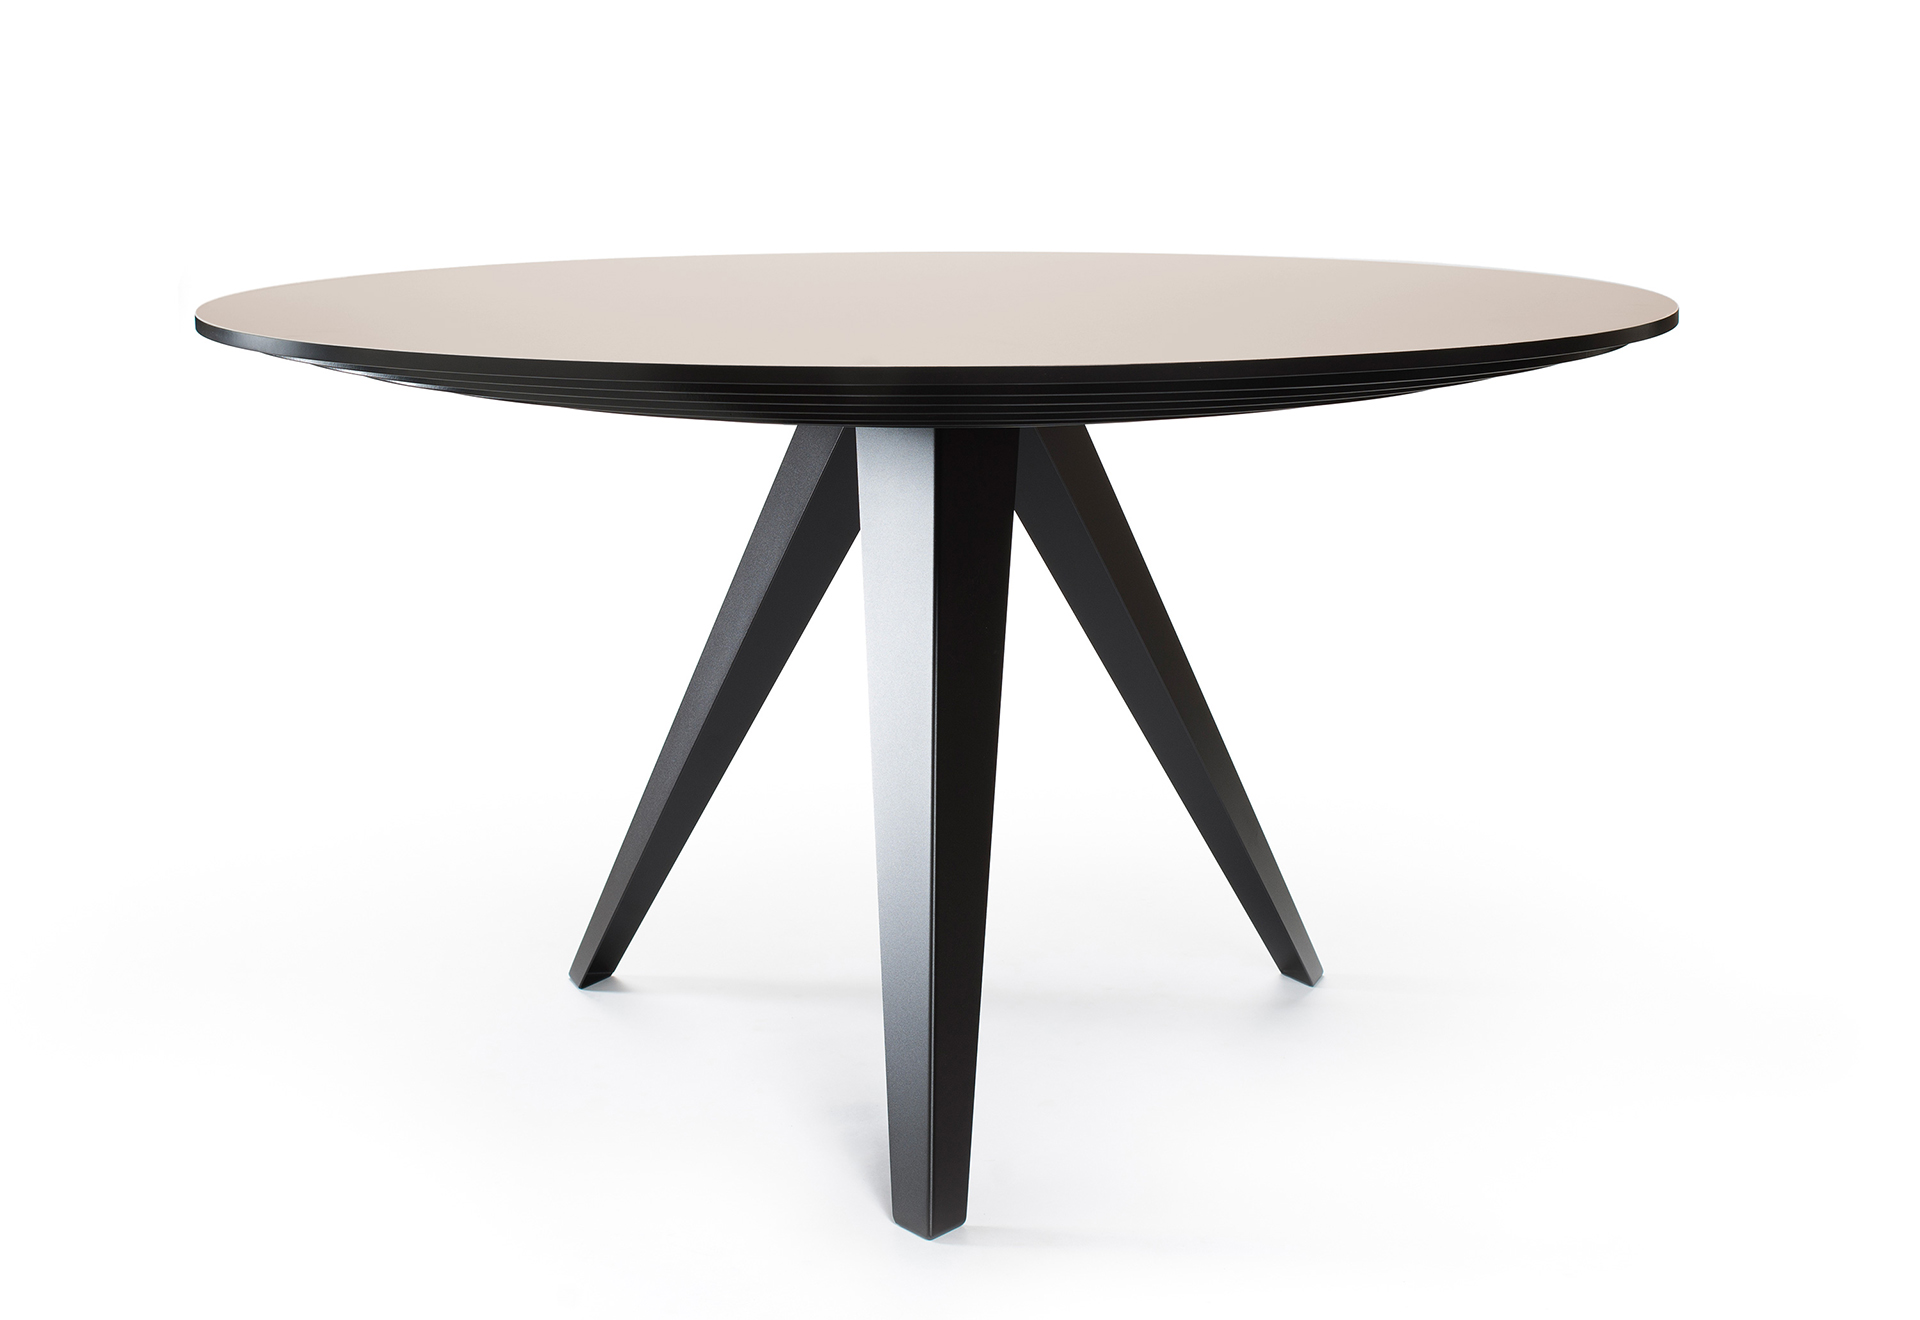 Tafel Rond 140.Ronde Eettafel Belly L Kees Marcelis L Odesi Your Dutch Design